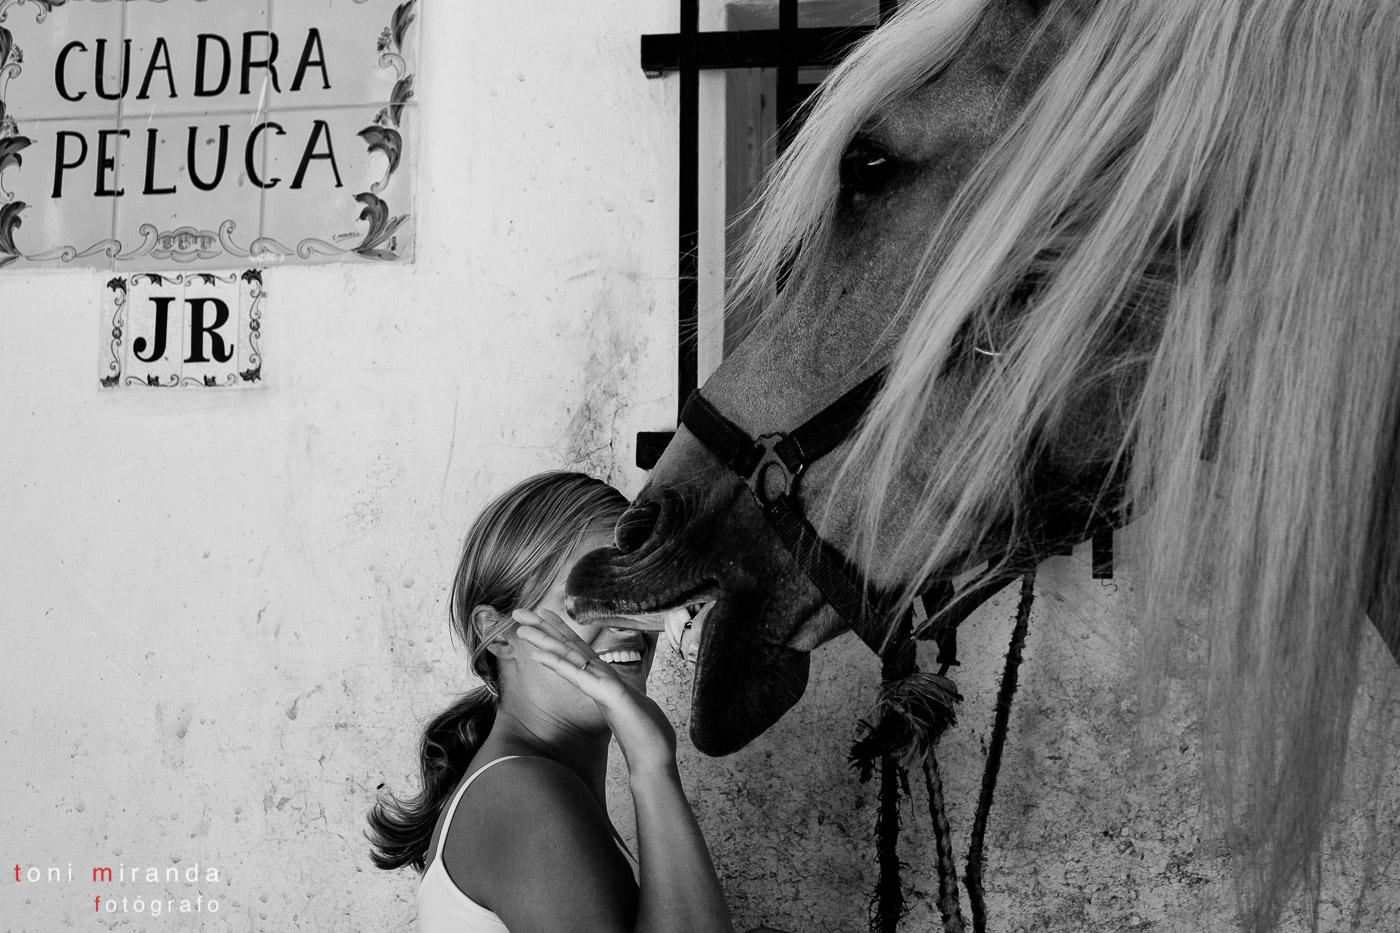 cuadra peluca novia con caballo